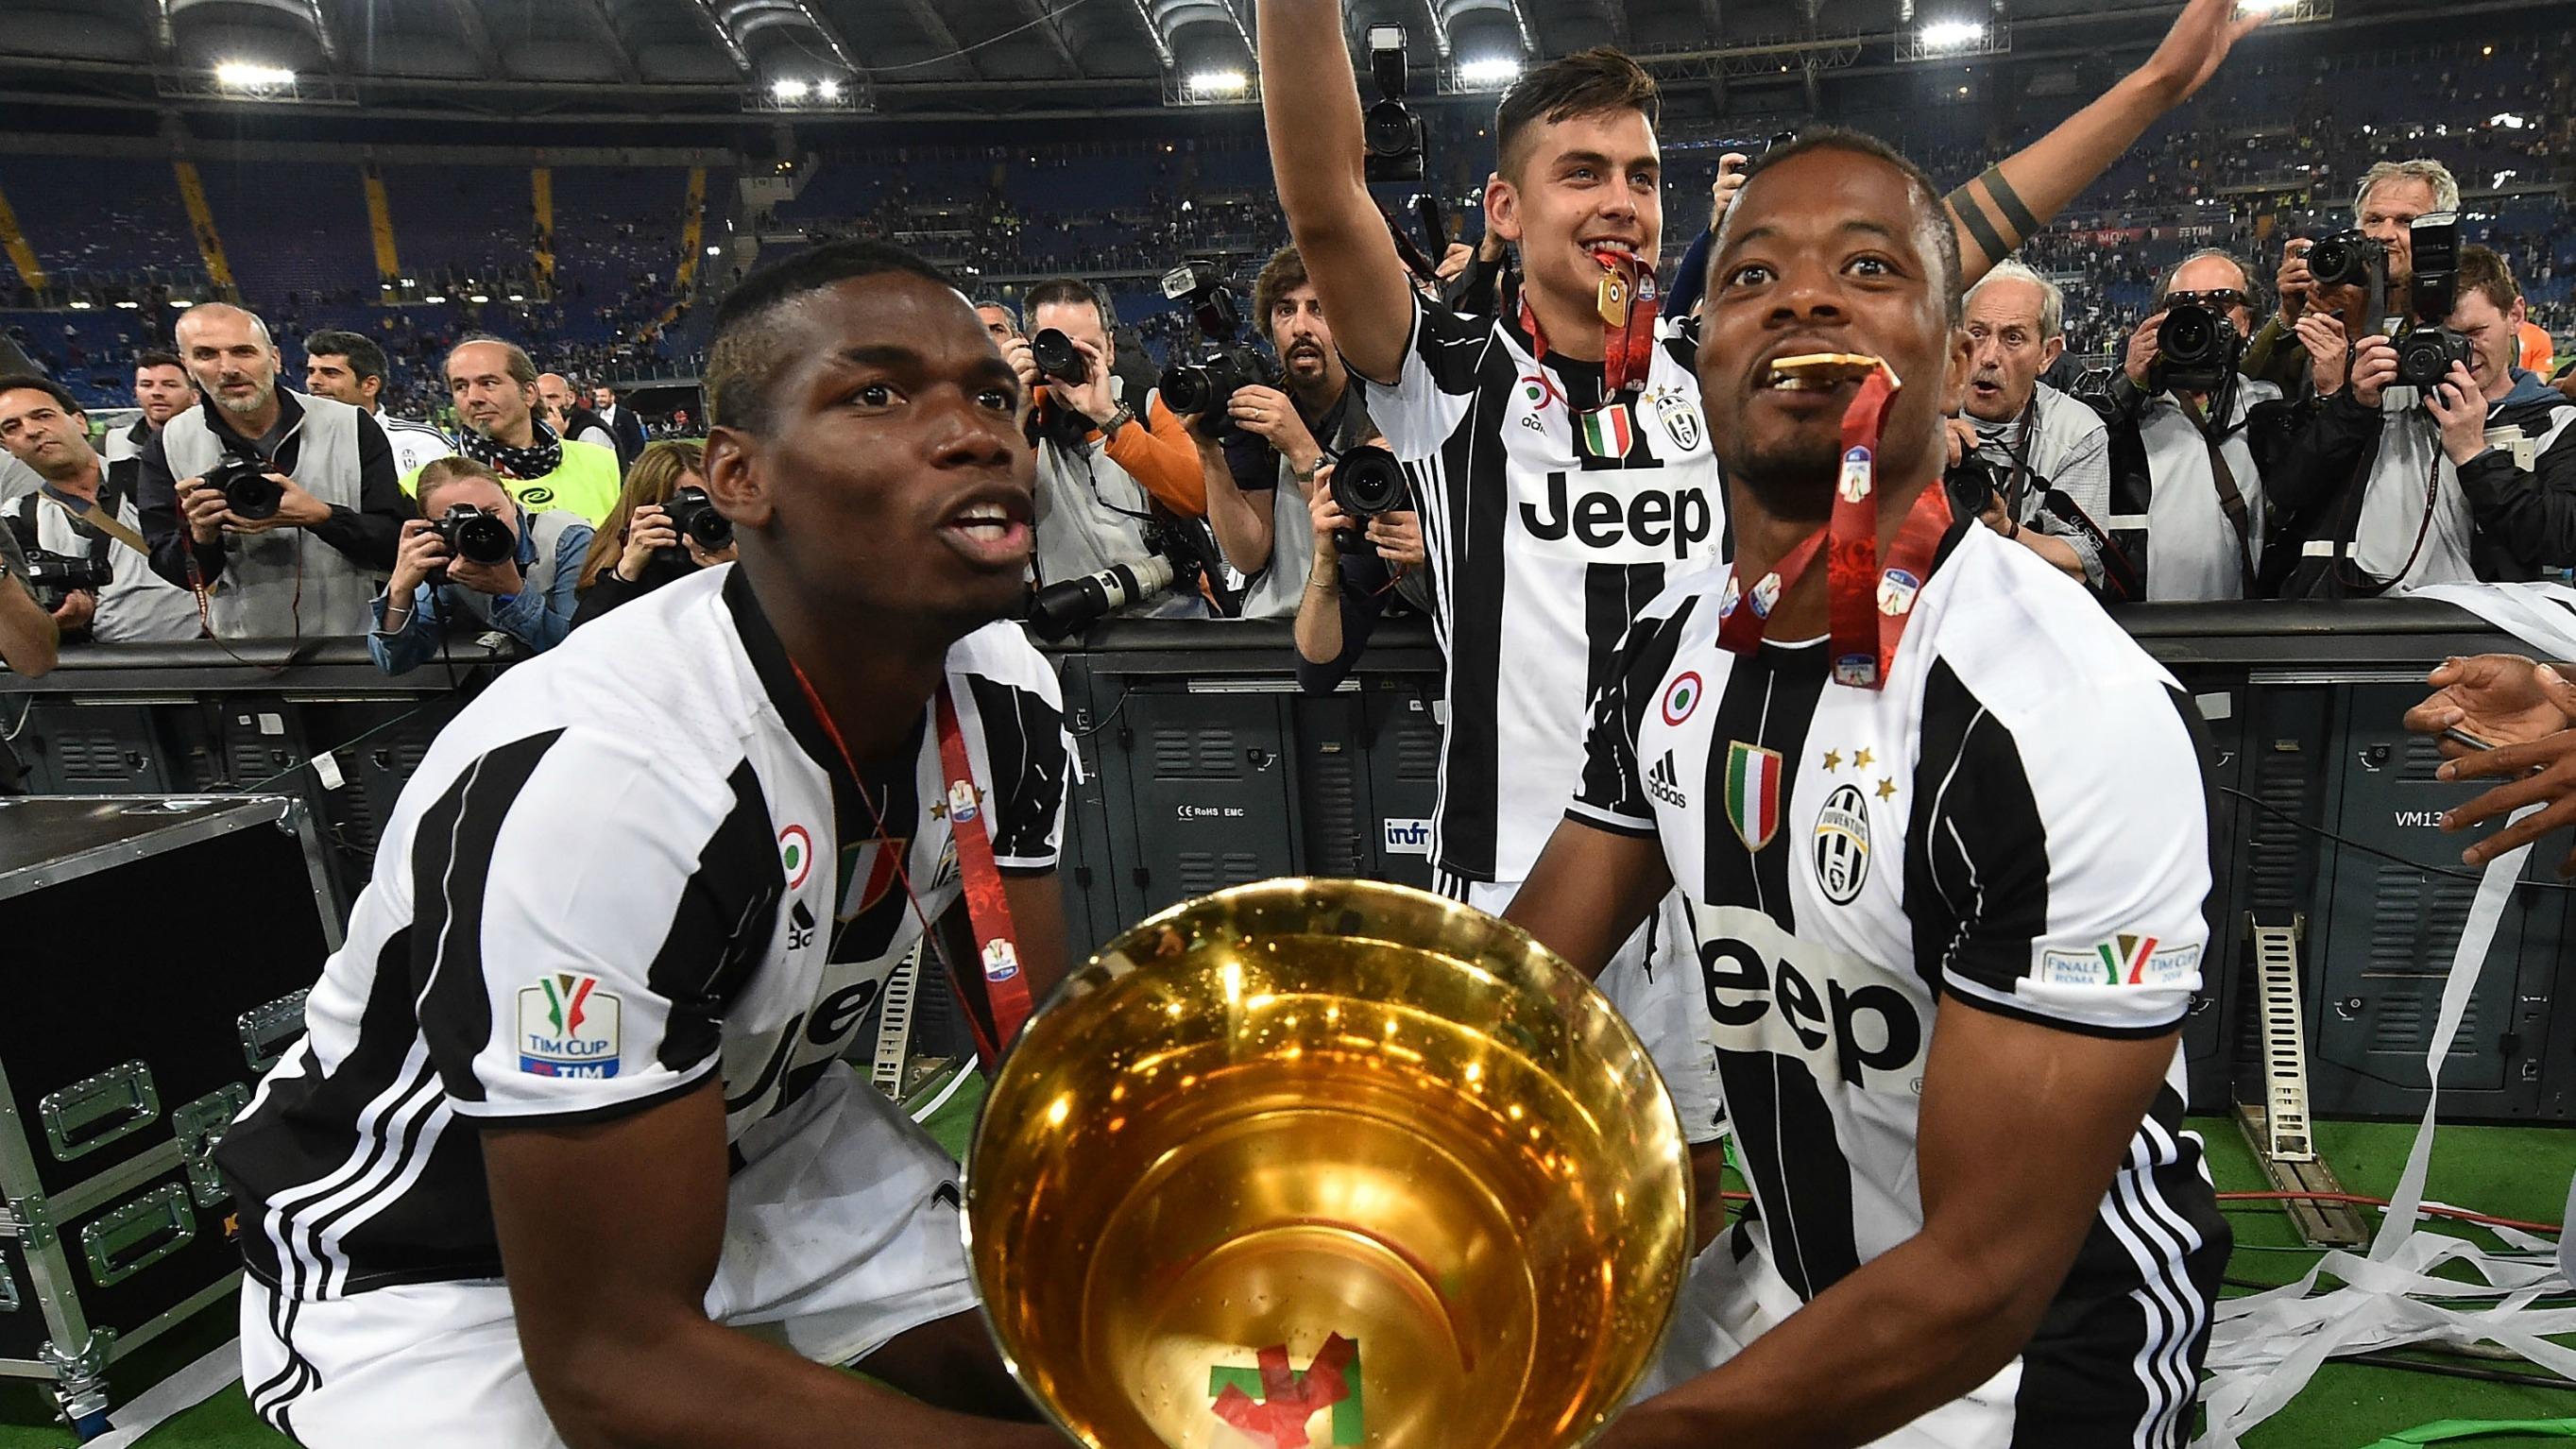 Juventus High Quality Wallpapers